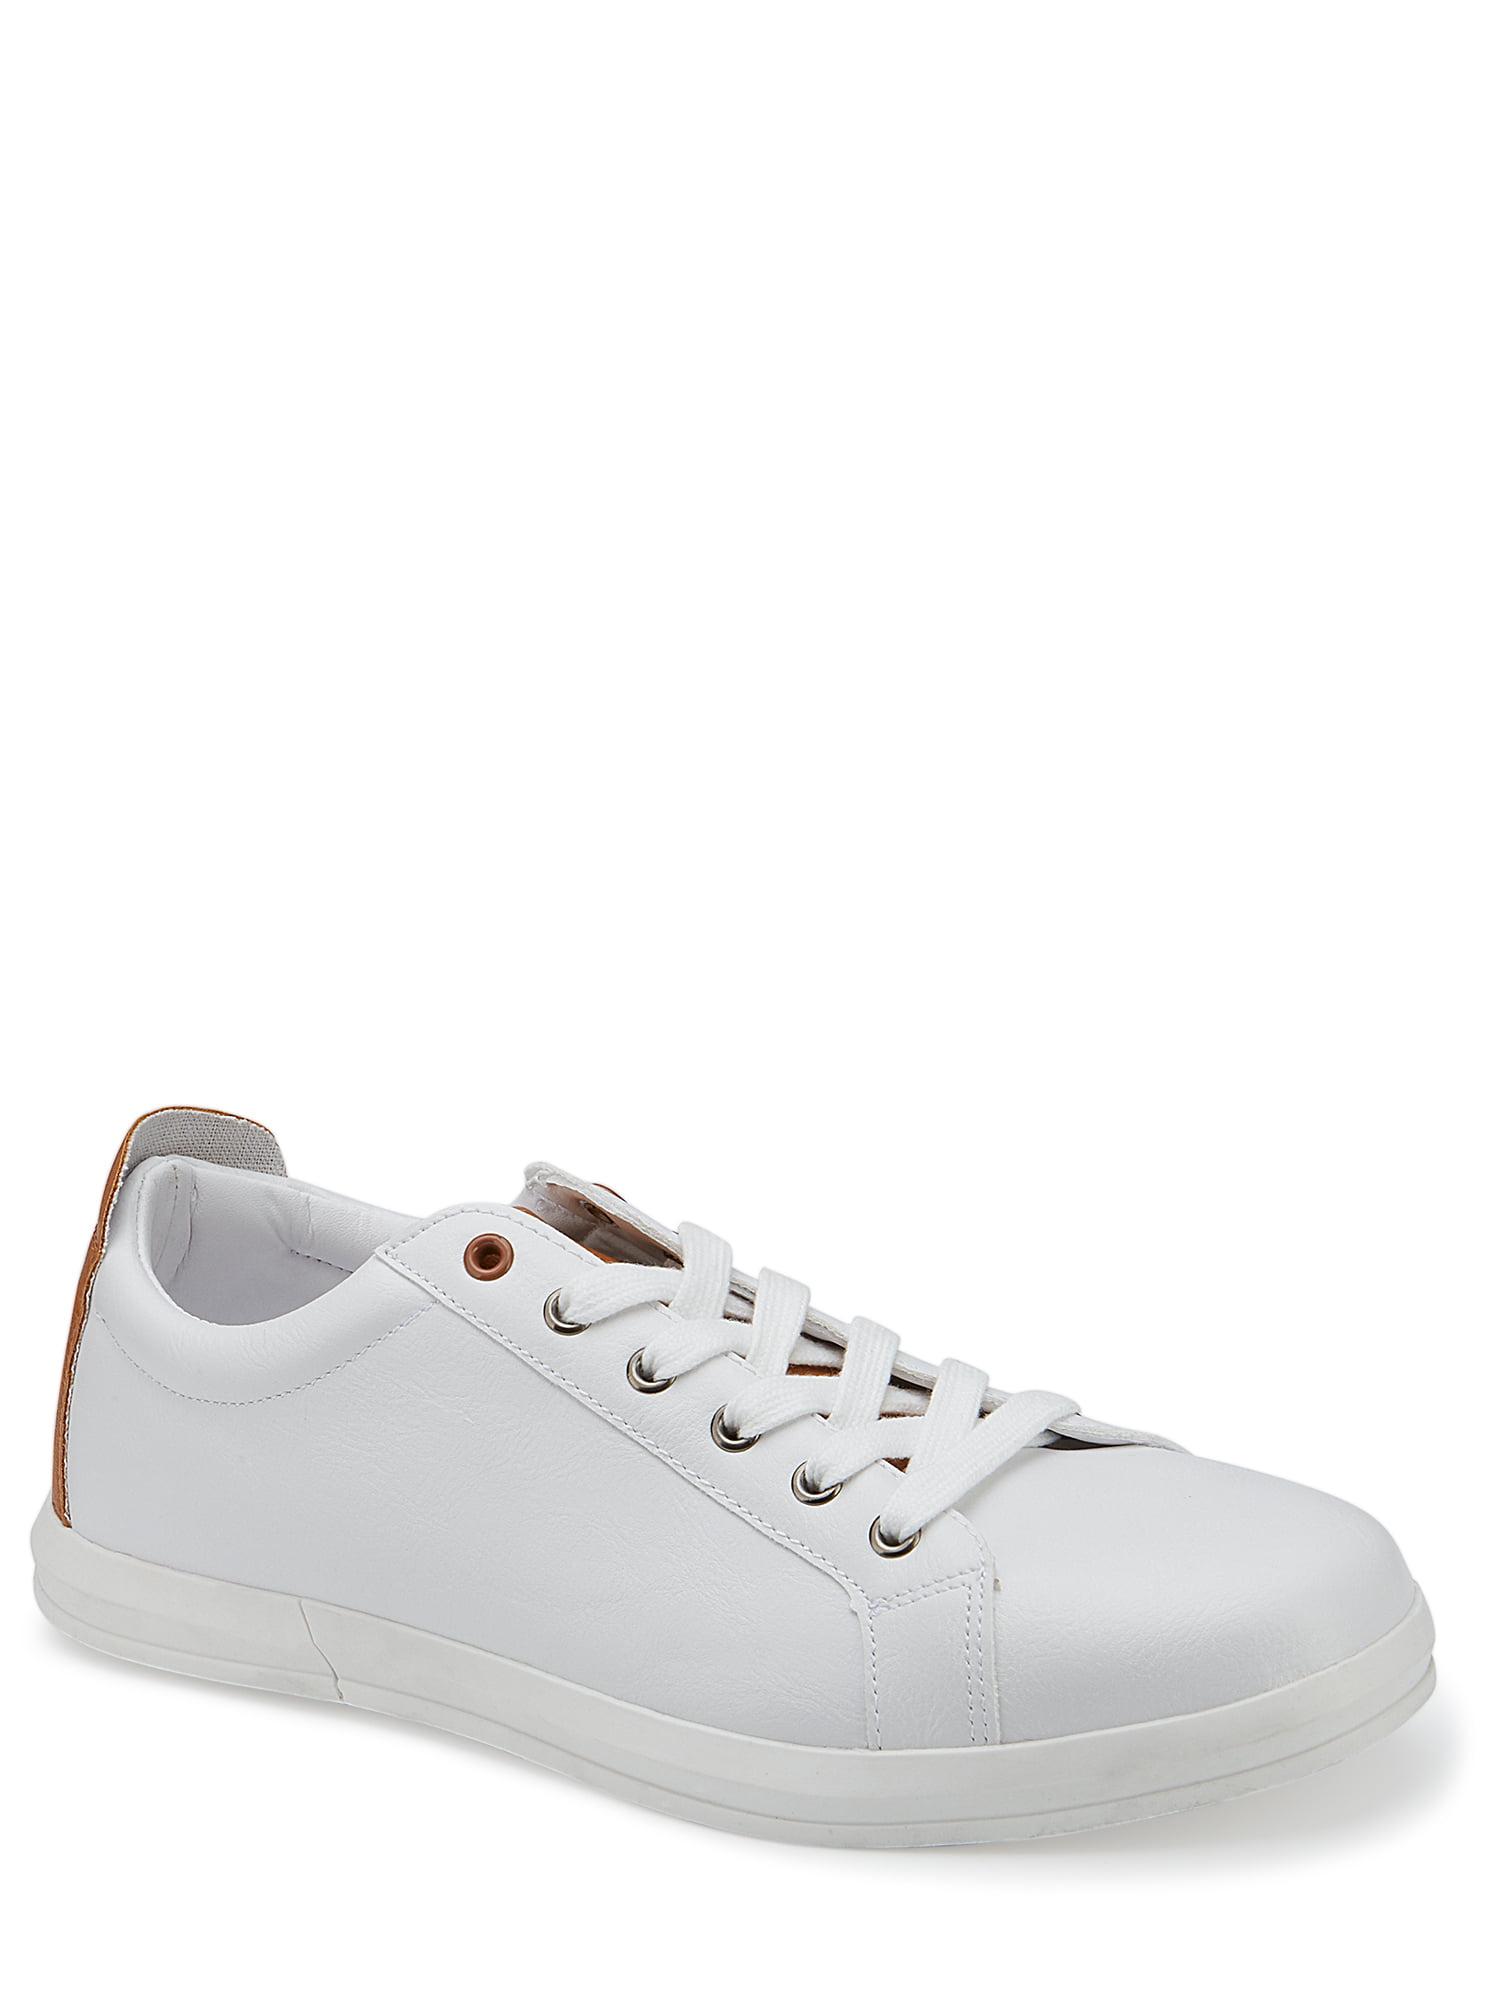 Xray Men's The Pokalde Casual Low-top Sneakers